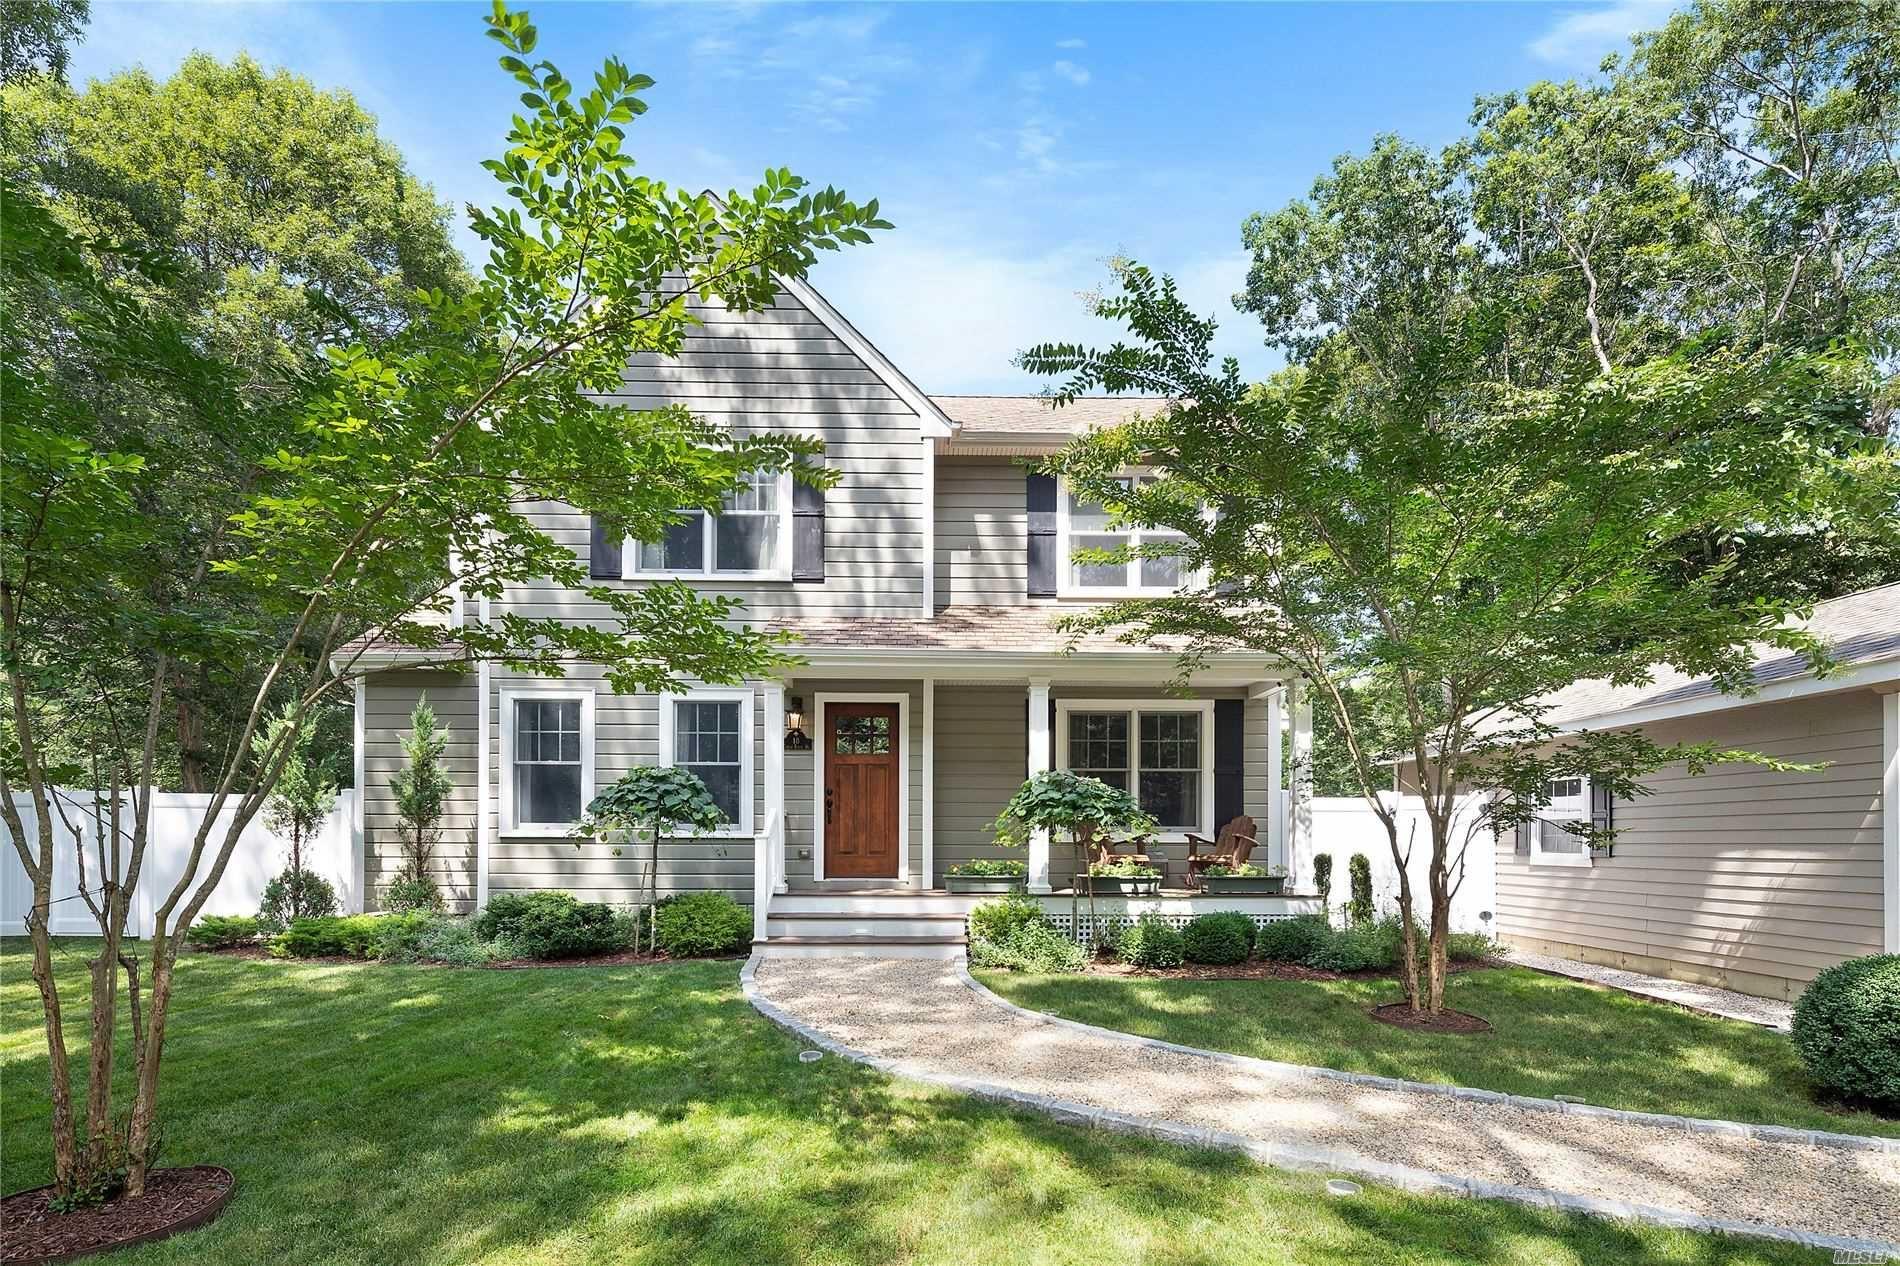 18 Cedar Ridge Dr, East Hampton, NY 11937 - MLS#: 3215081